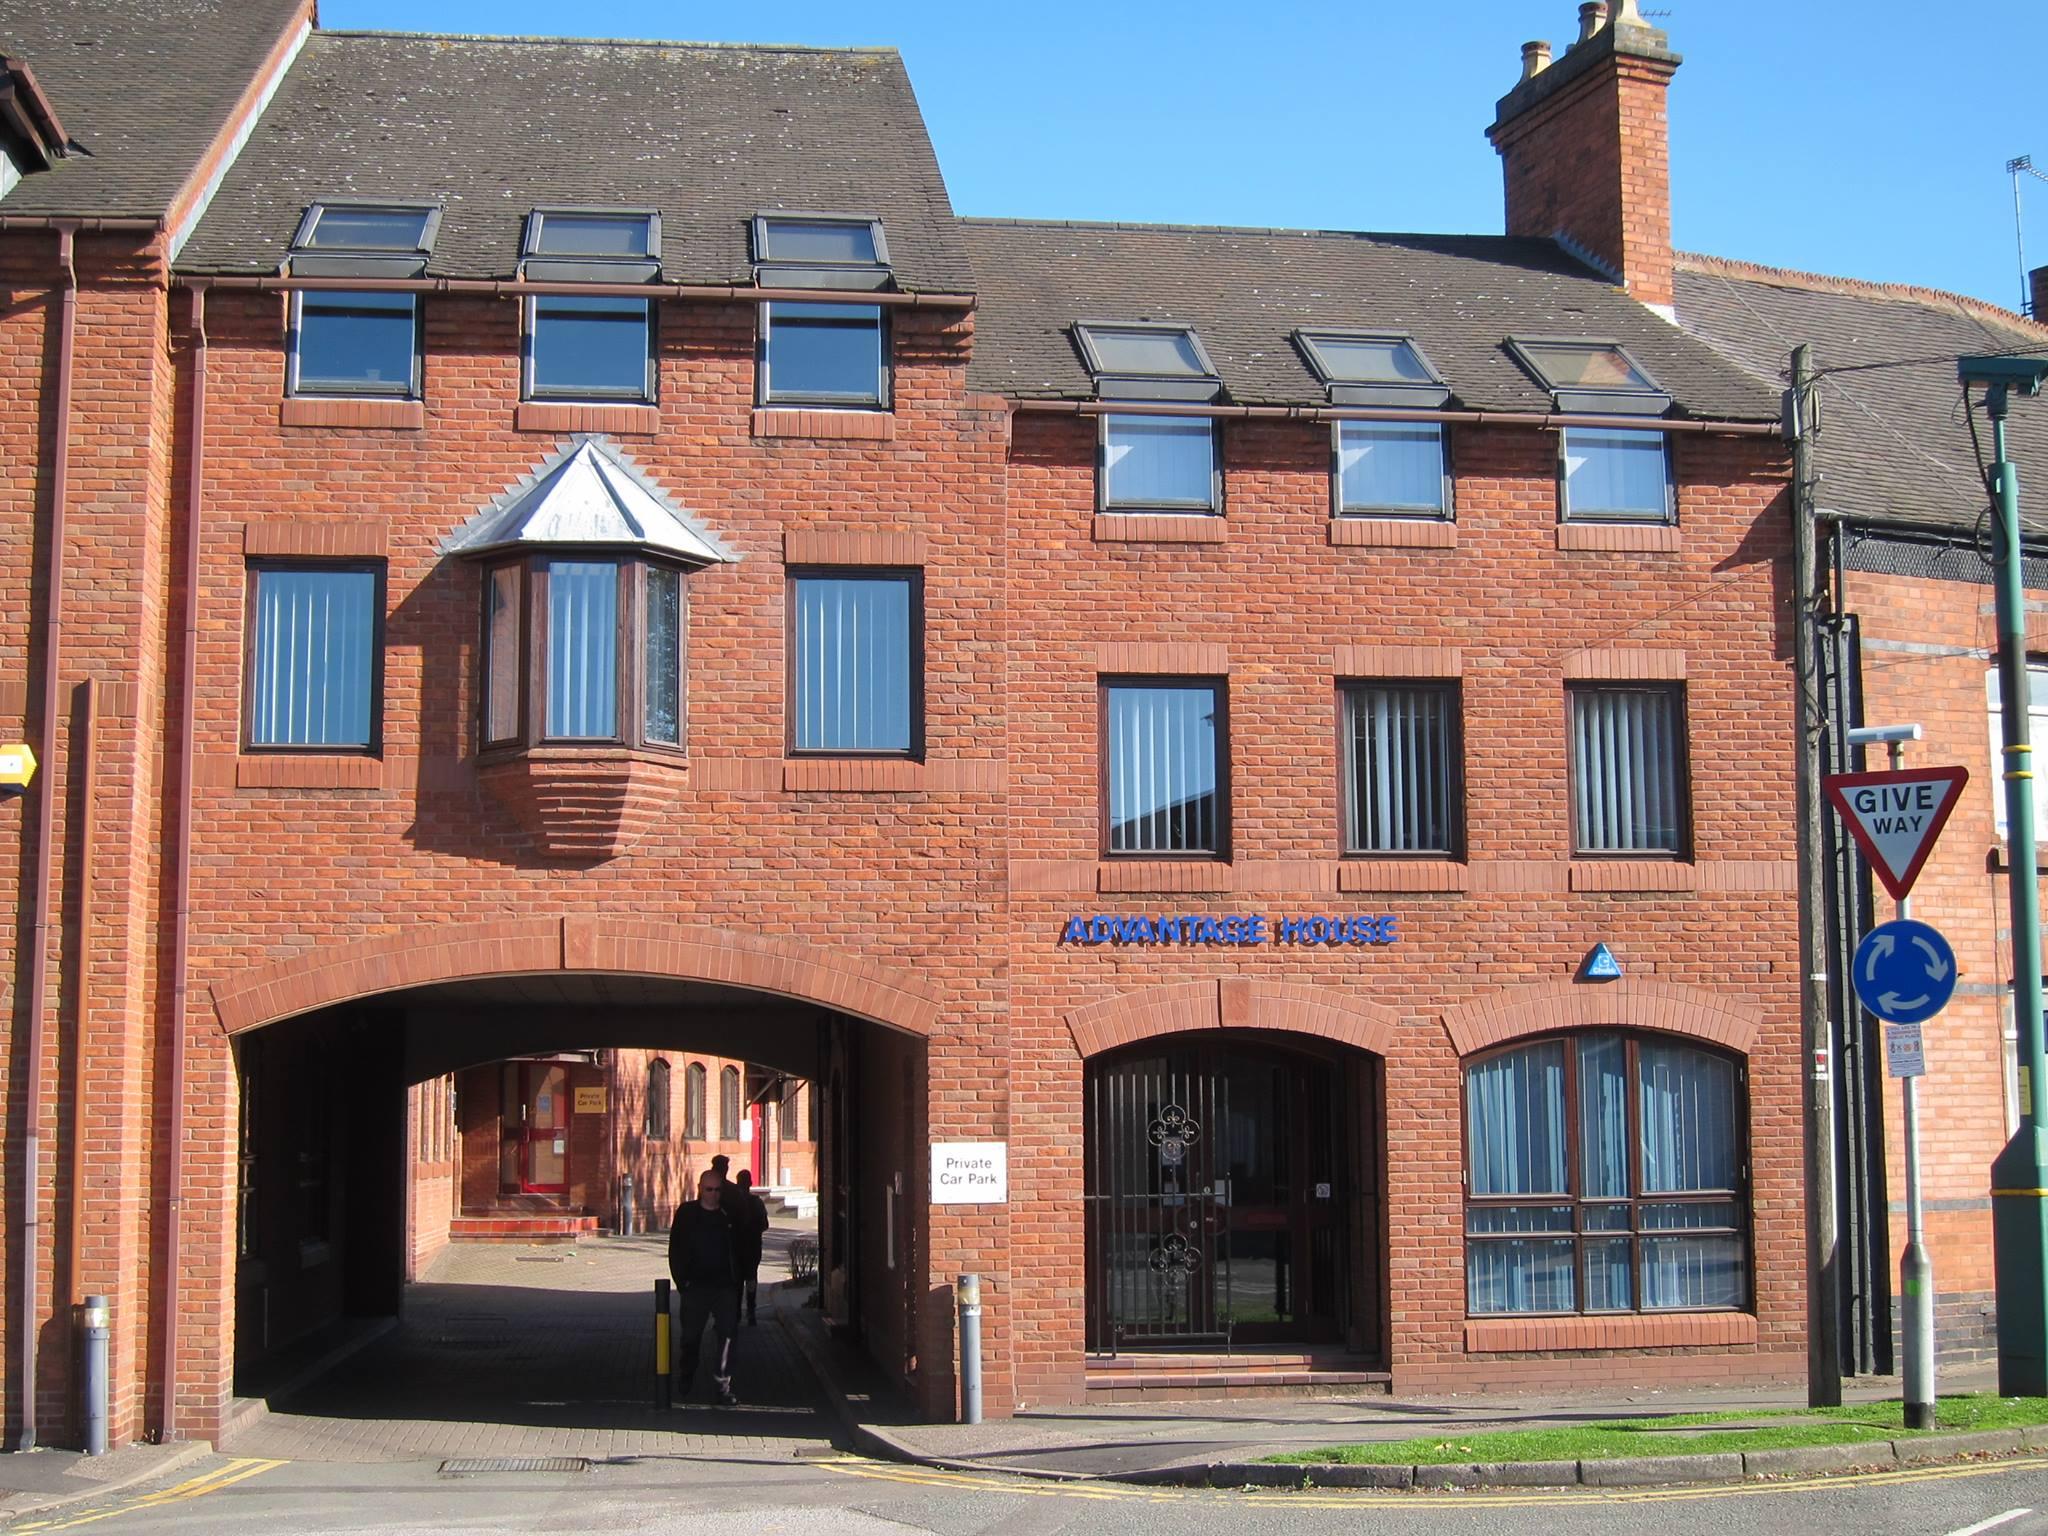 Advantage House Lichfield